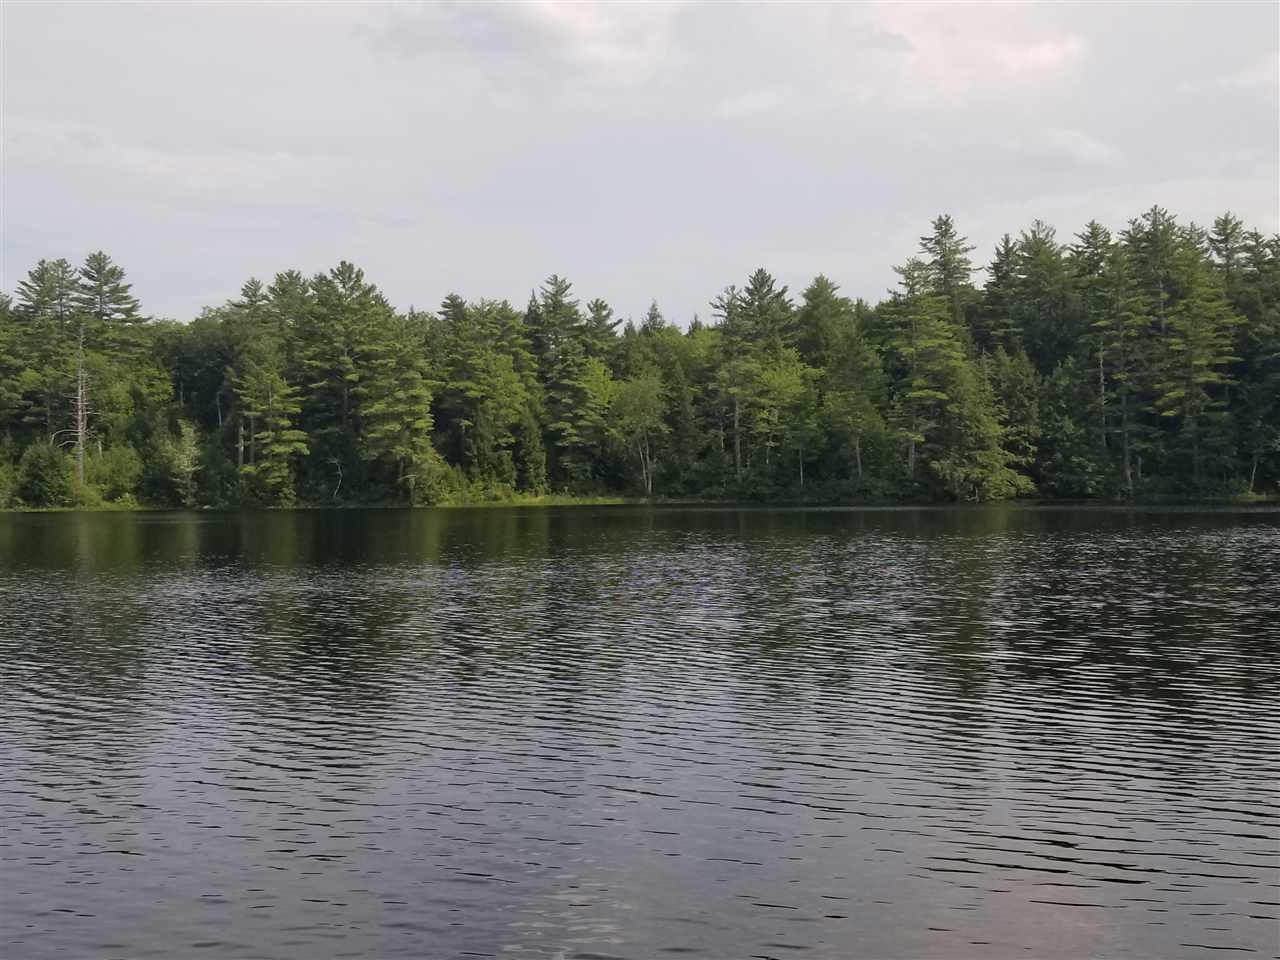 MLS 4711493: NA Forest Pond, New Hampton NH